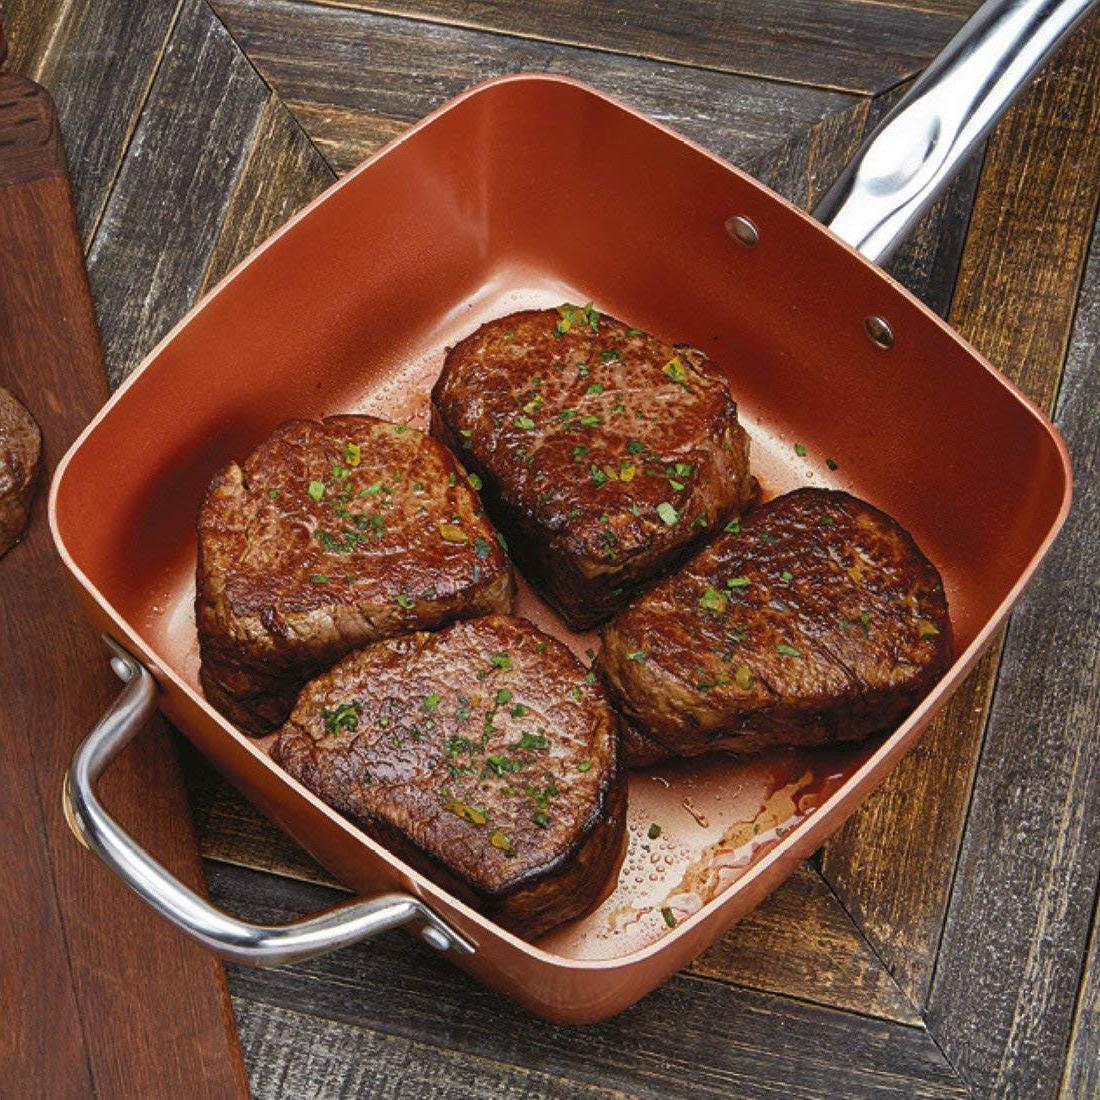 Copper Chef Cookware 10 Deep Frying